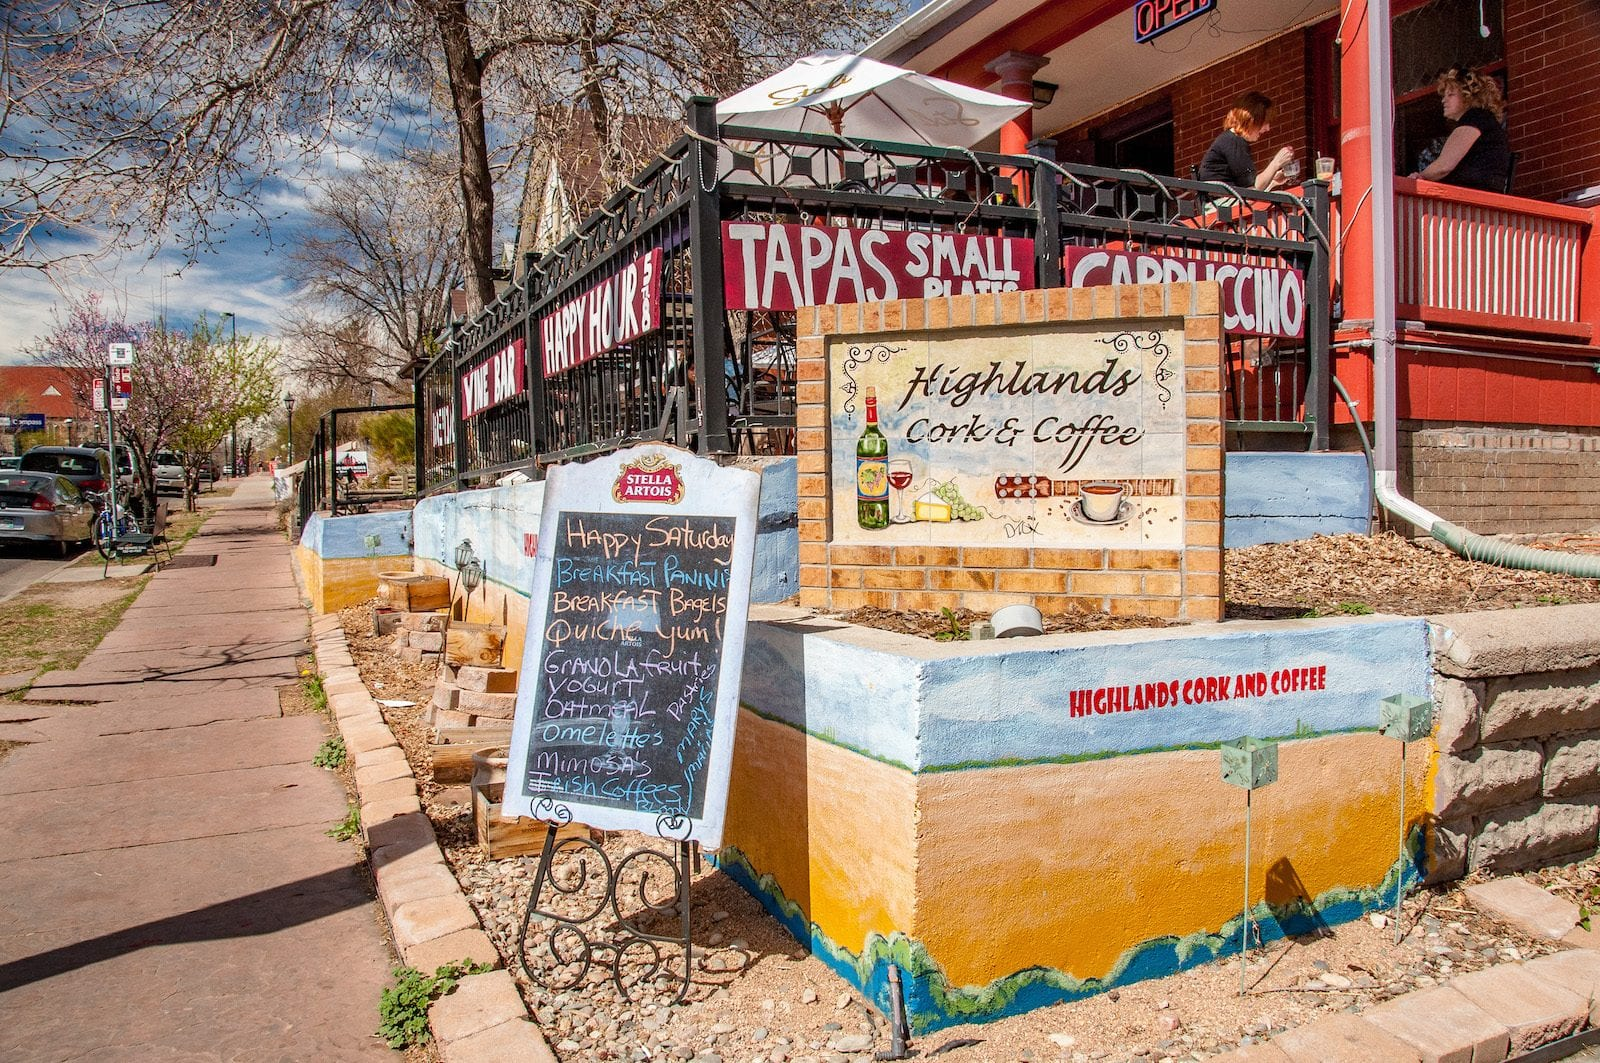 Highlands Cork & Coffee, Denver